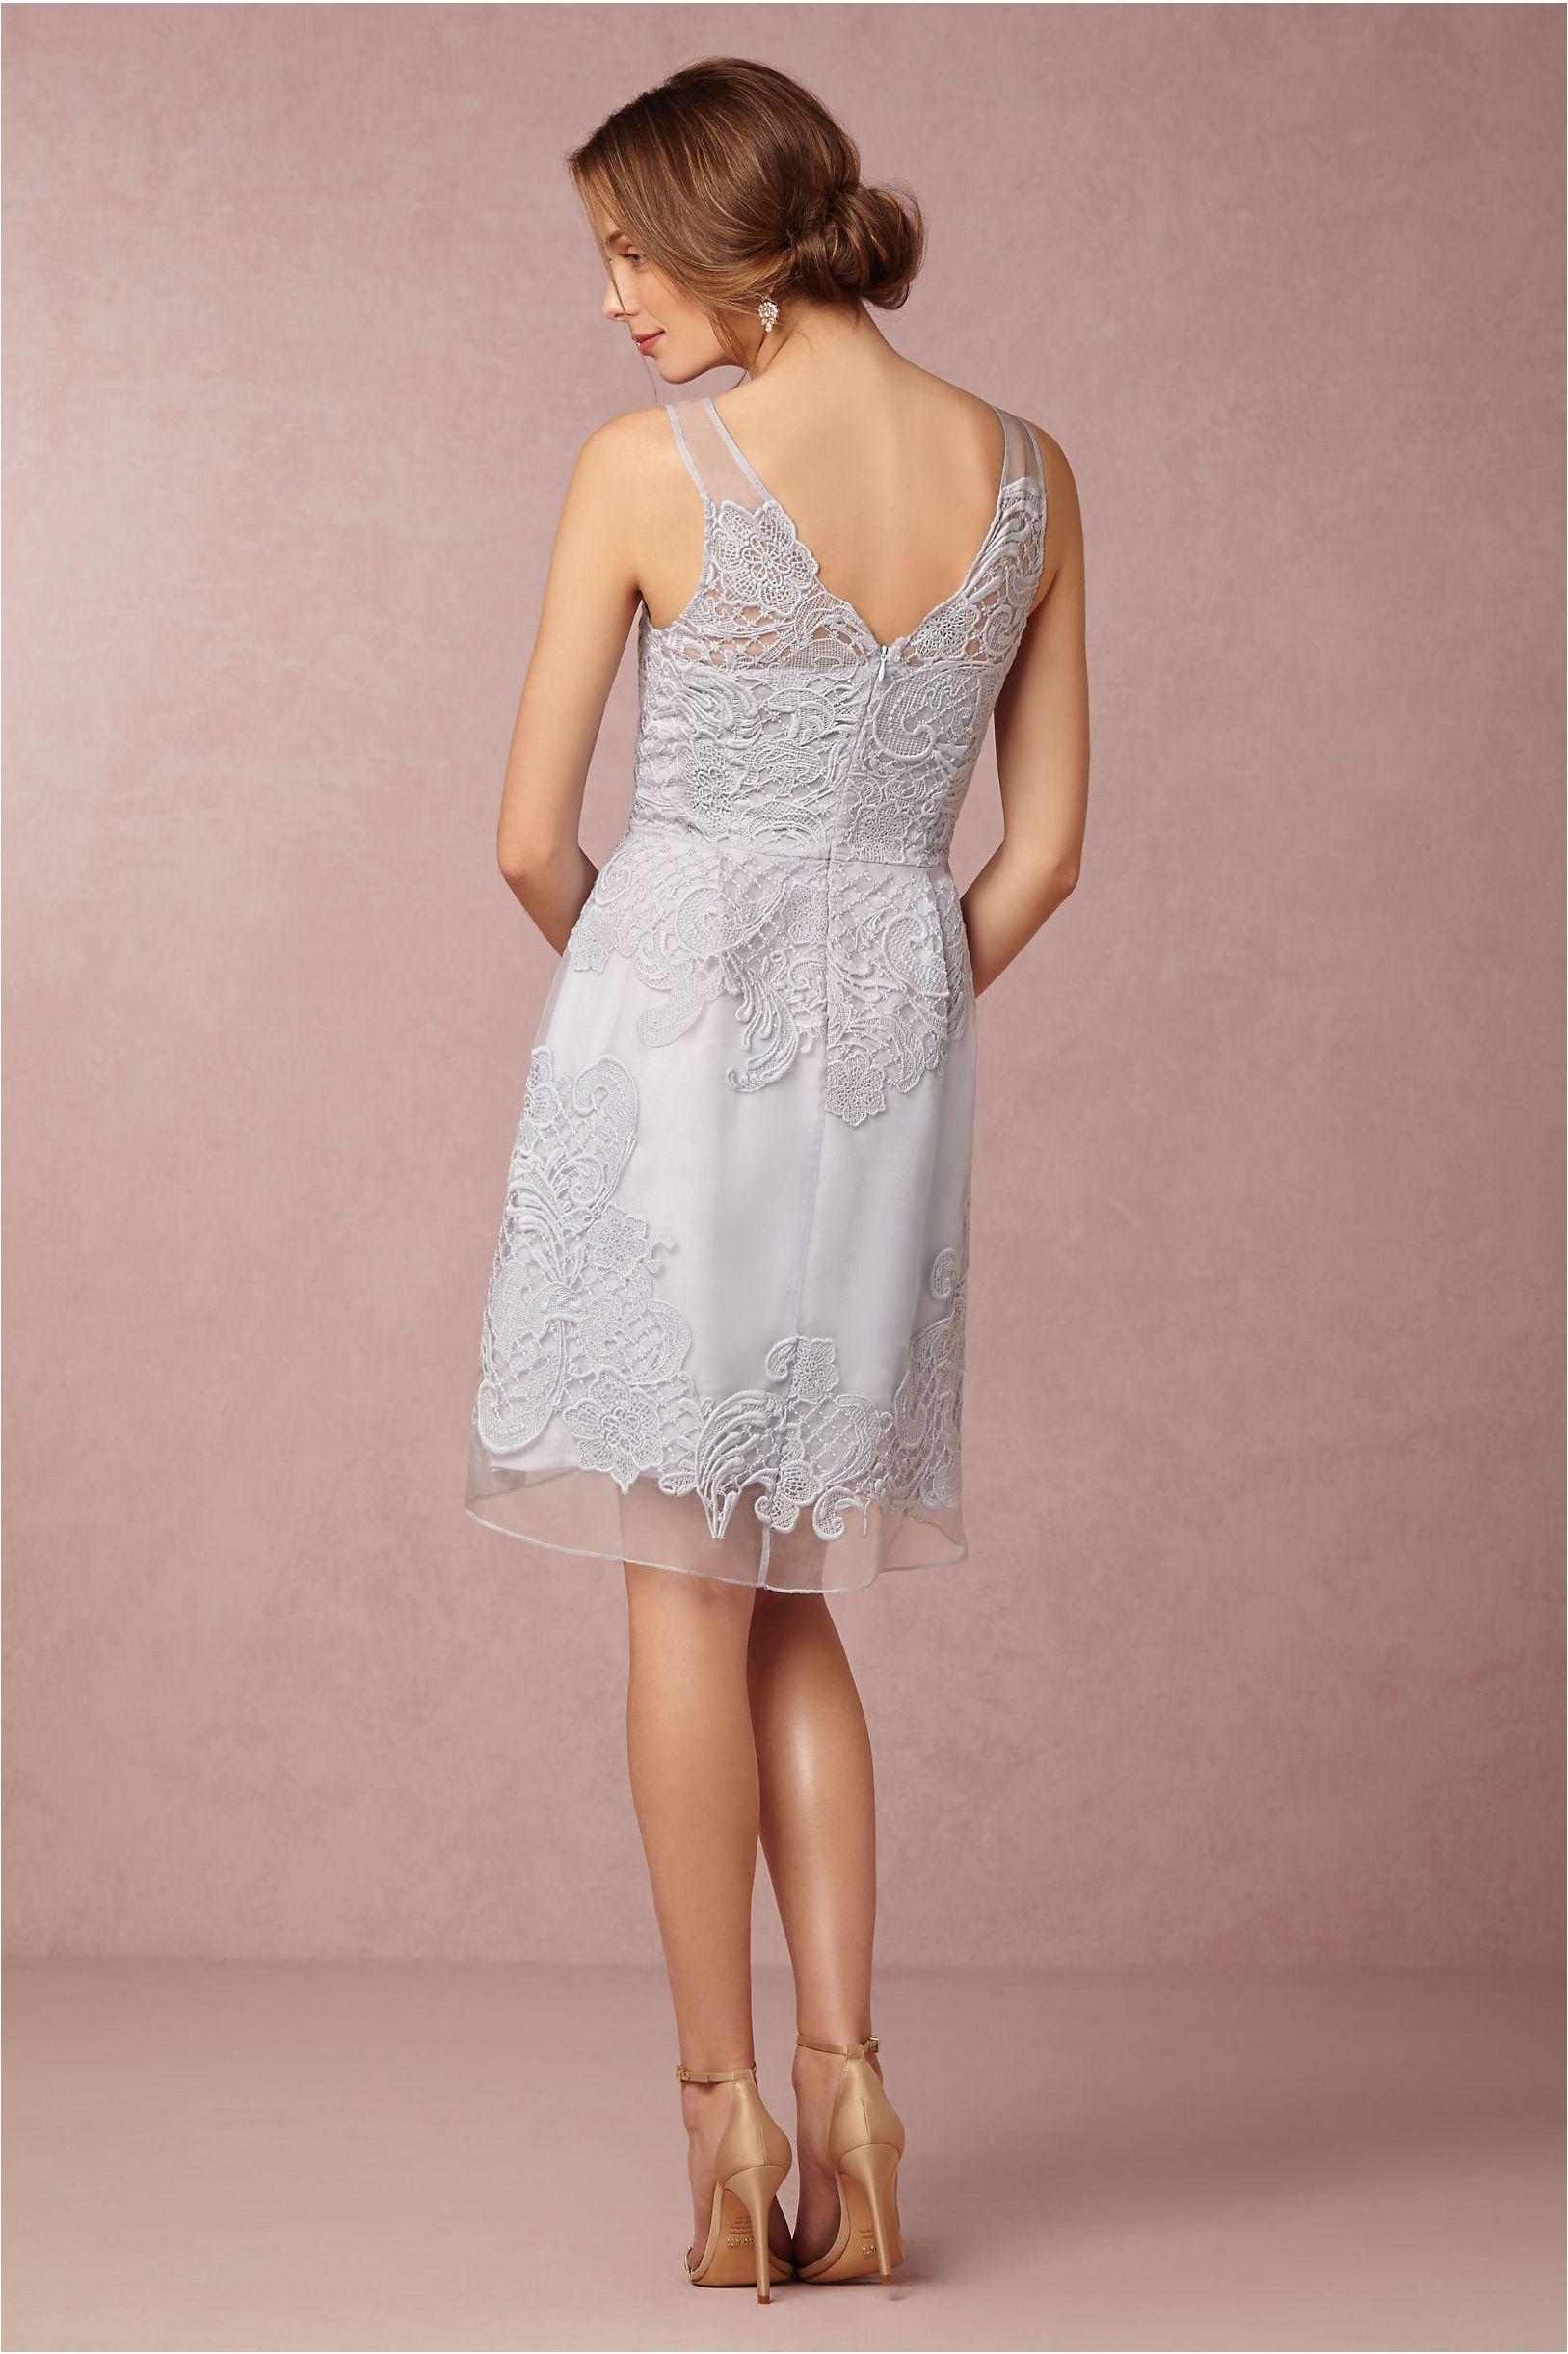 100+ Cute Lace Short Bridesmaid Dresses Trends and Ideas   Pinterest